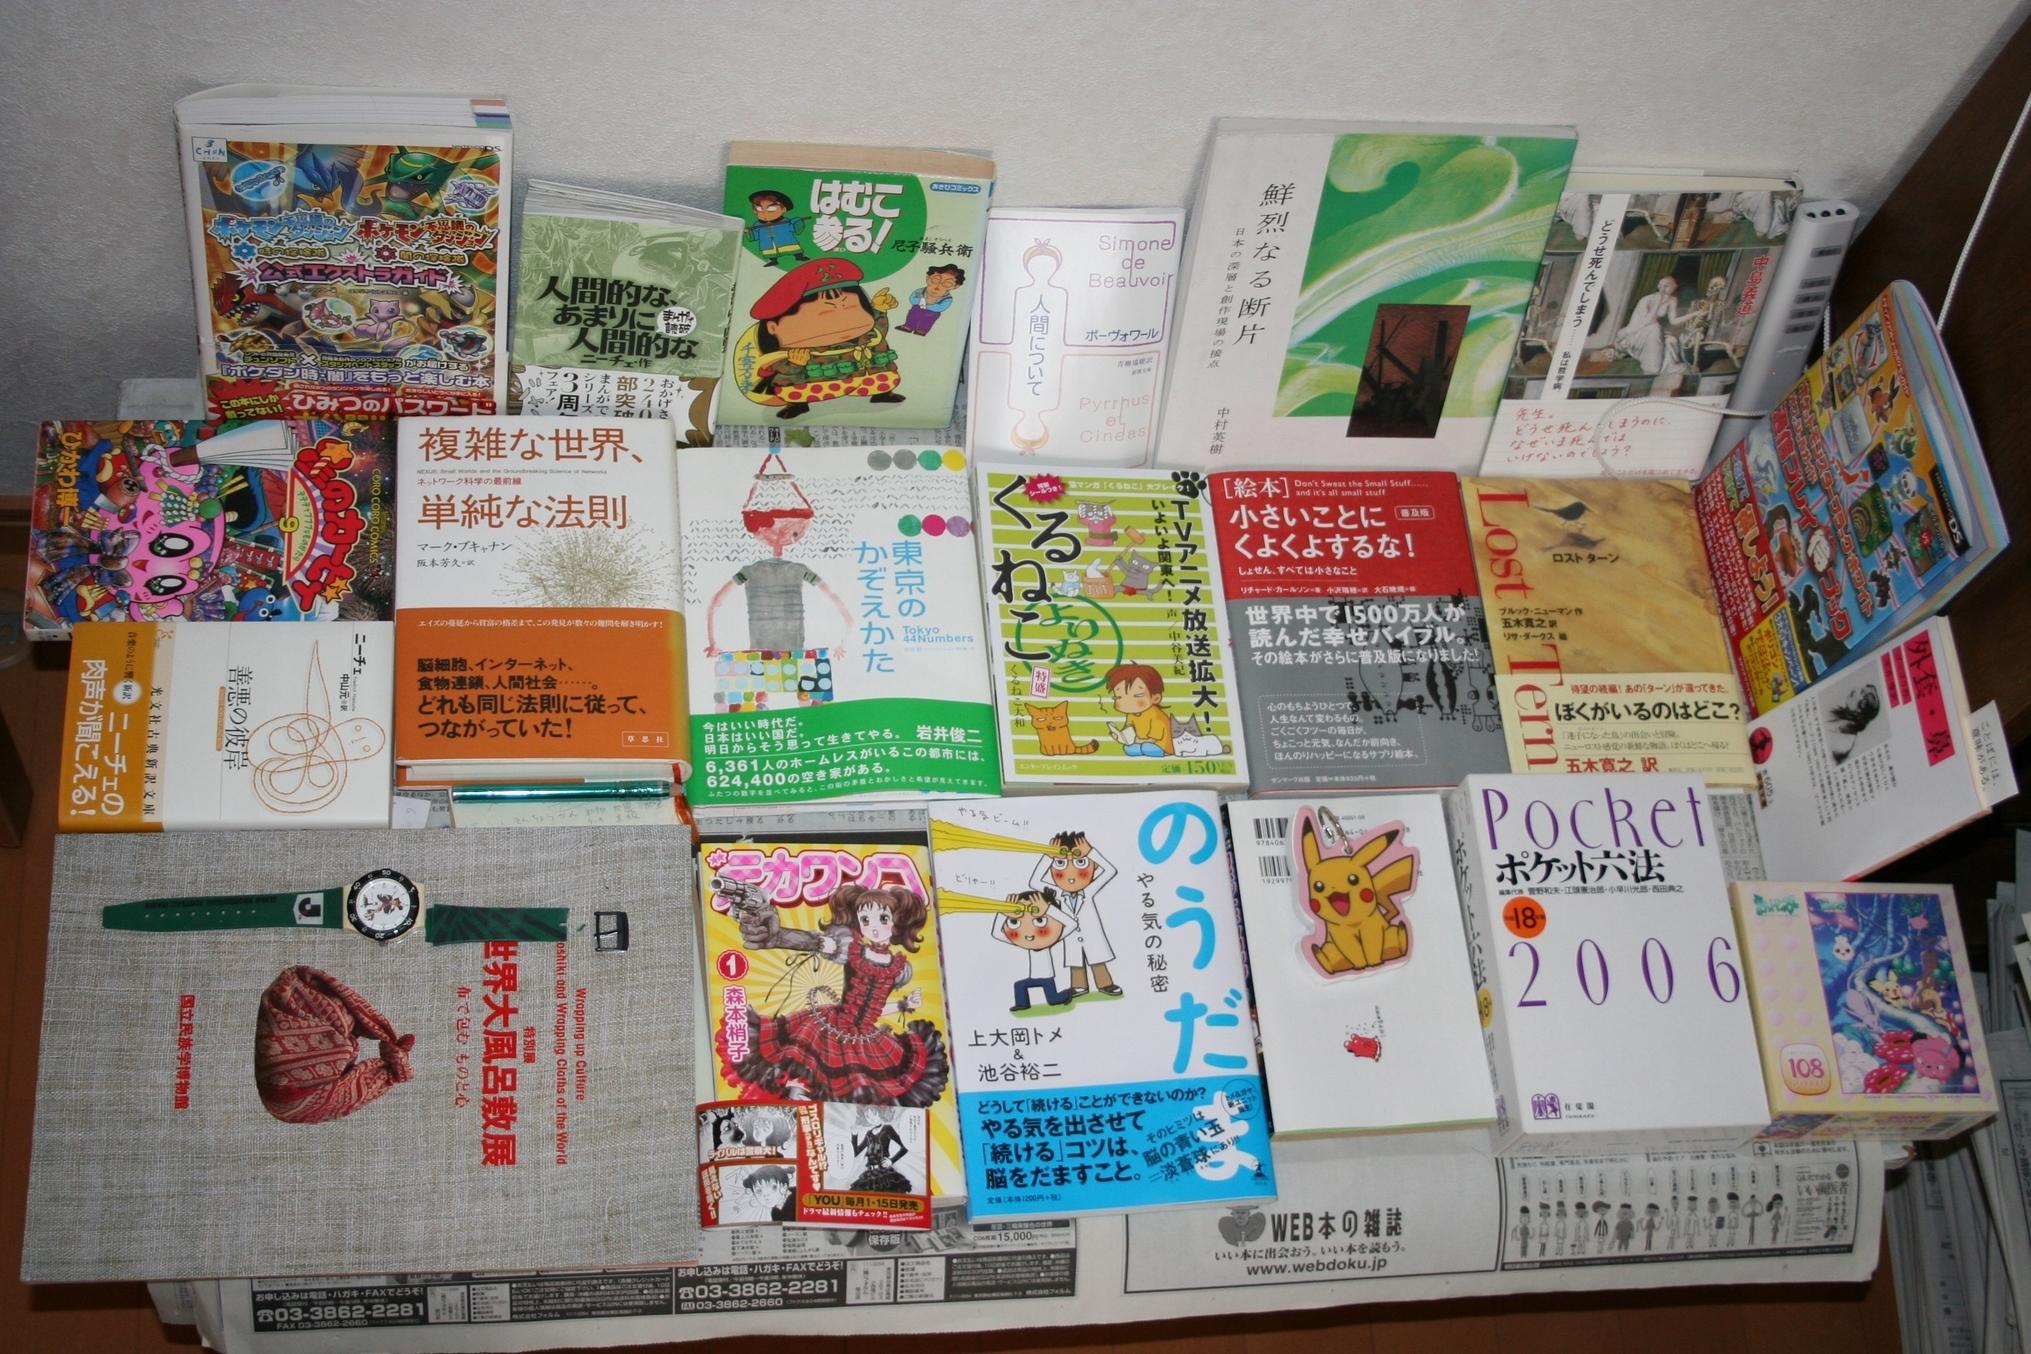 f:id:Df-kyounoyume-Sneonstiamlegnita:20110624160505j:plain